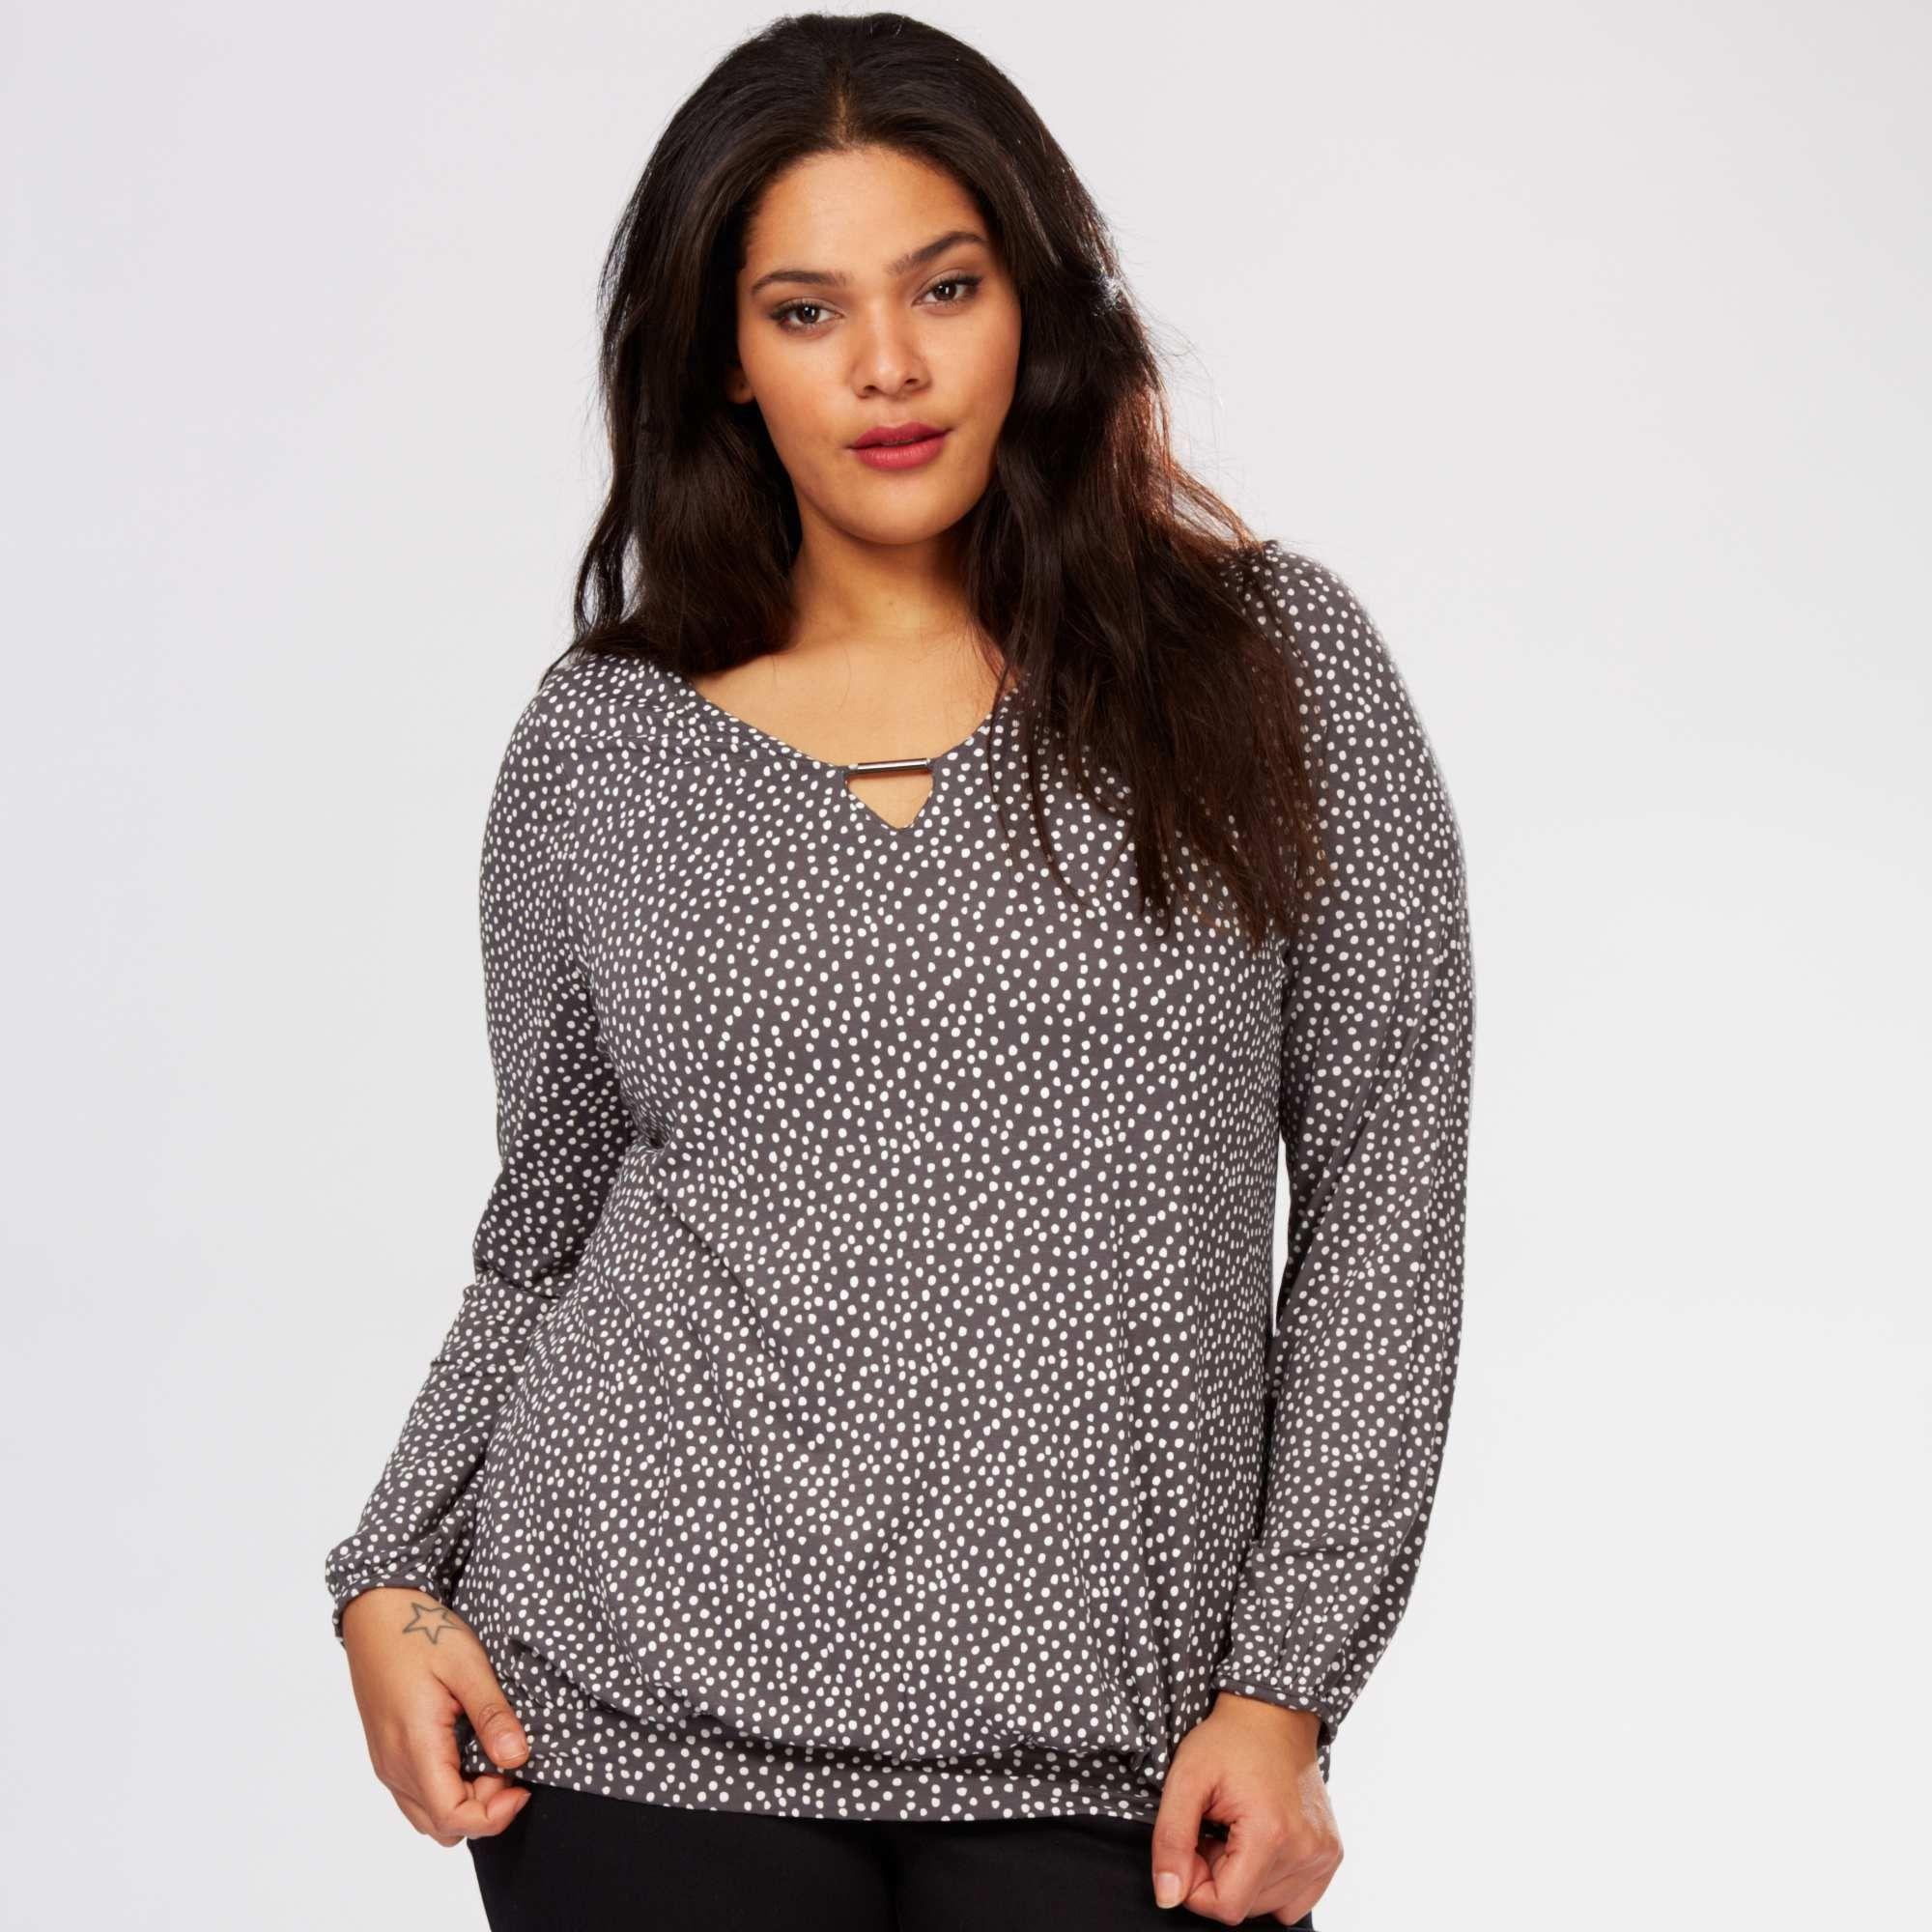 310fcd4c95ca59 Tee-shirt avec bijou Grande taille femme - Kiabi - 15,00€ | Curvy ...